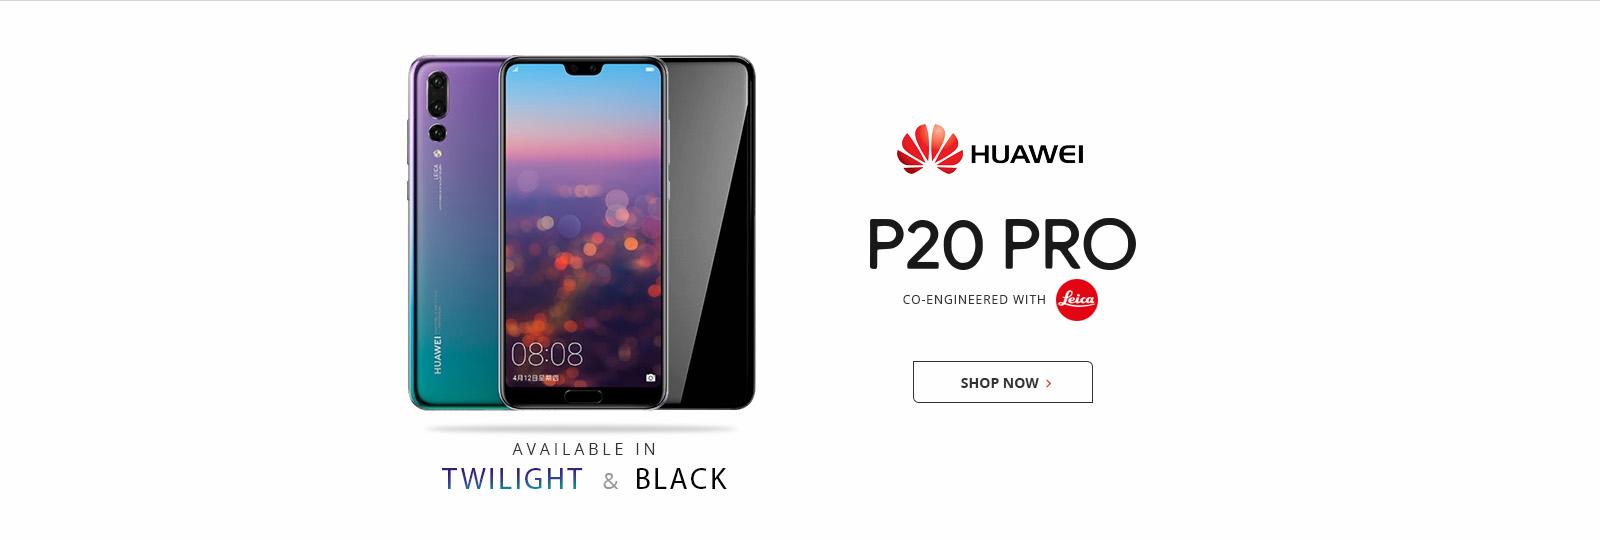 Huawei P20 Pro (Twilight & Black)